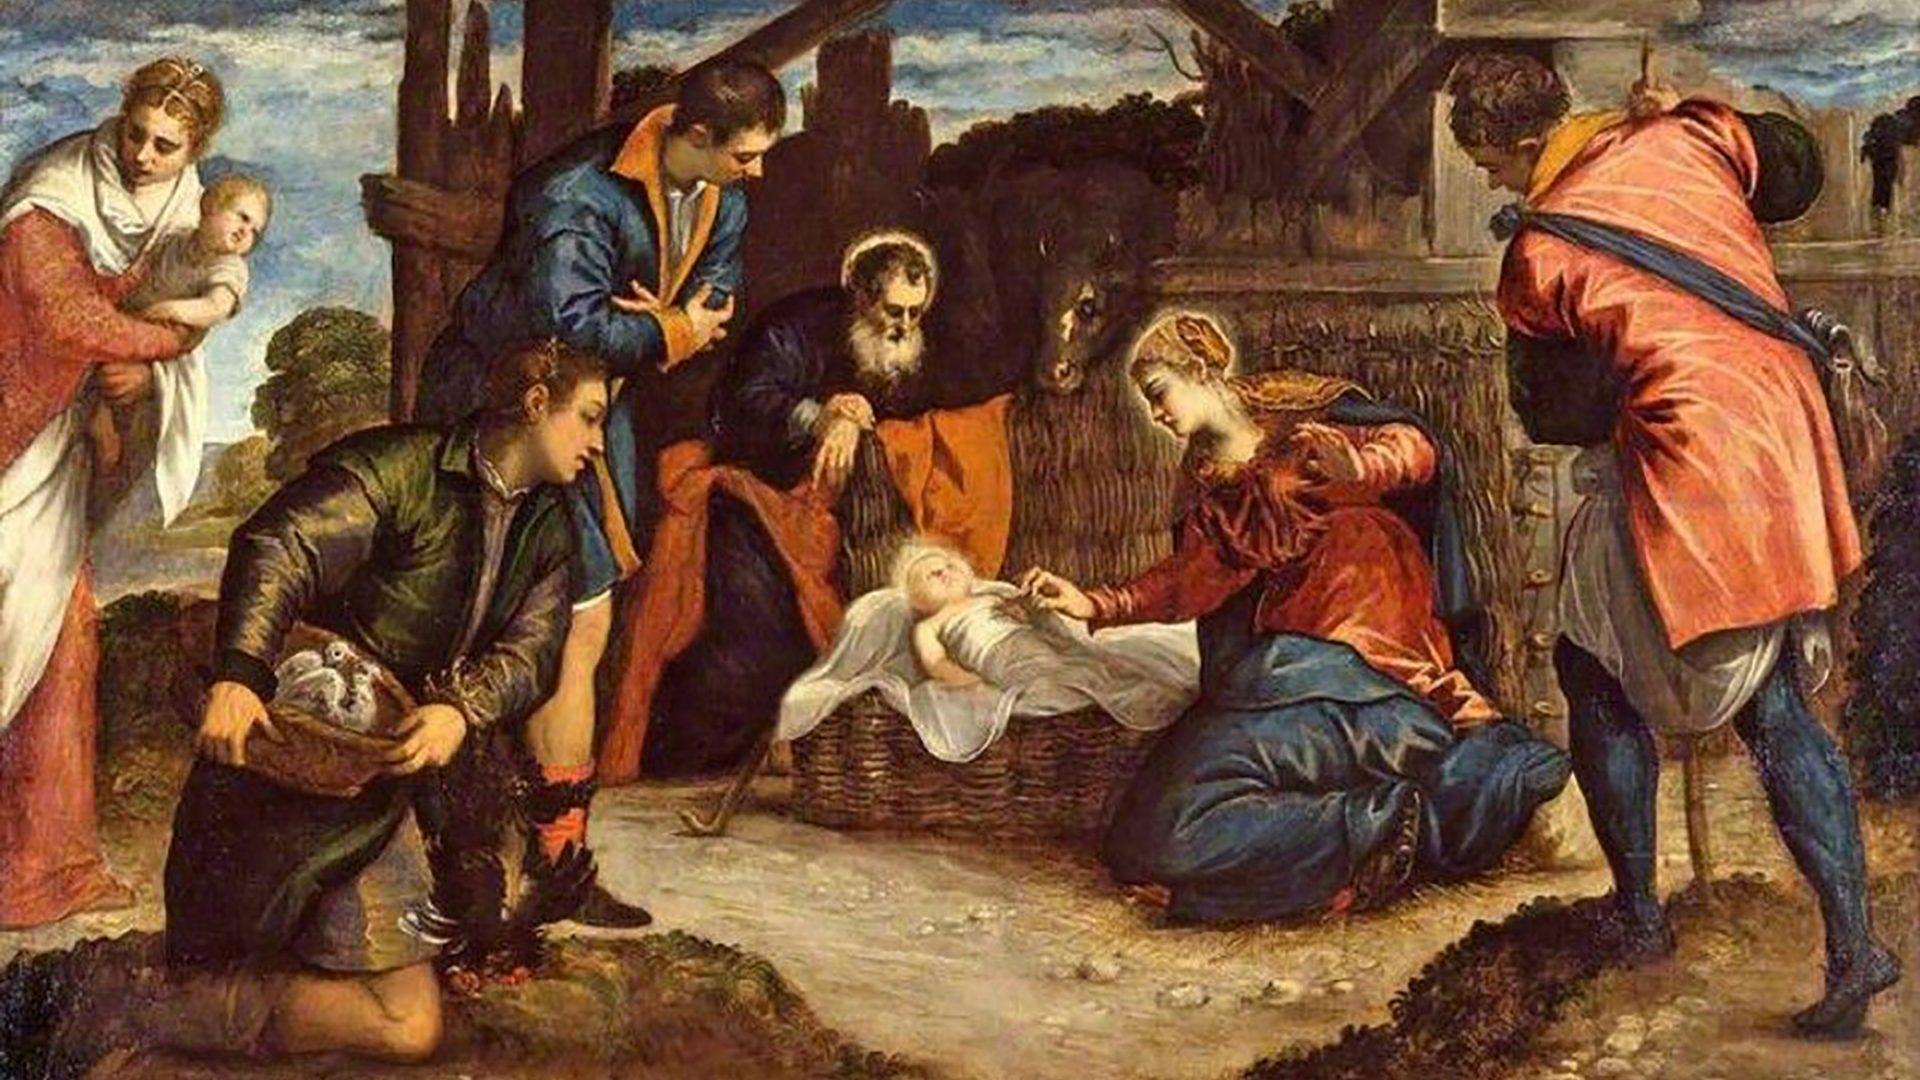 Tintoretto Adoration of the Magi, for our Baroque Christmas